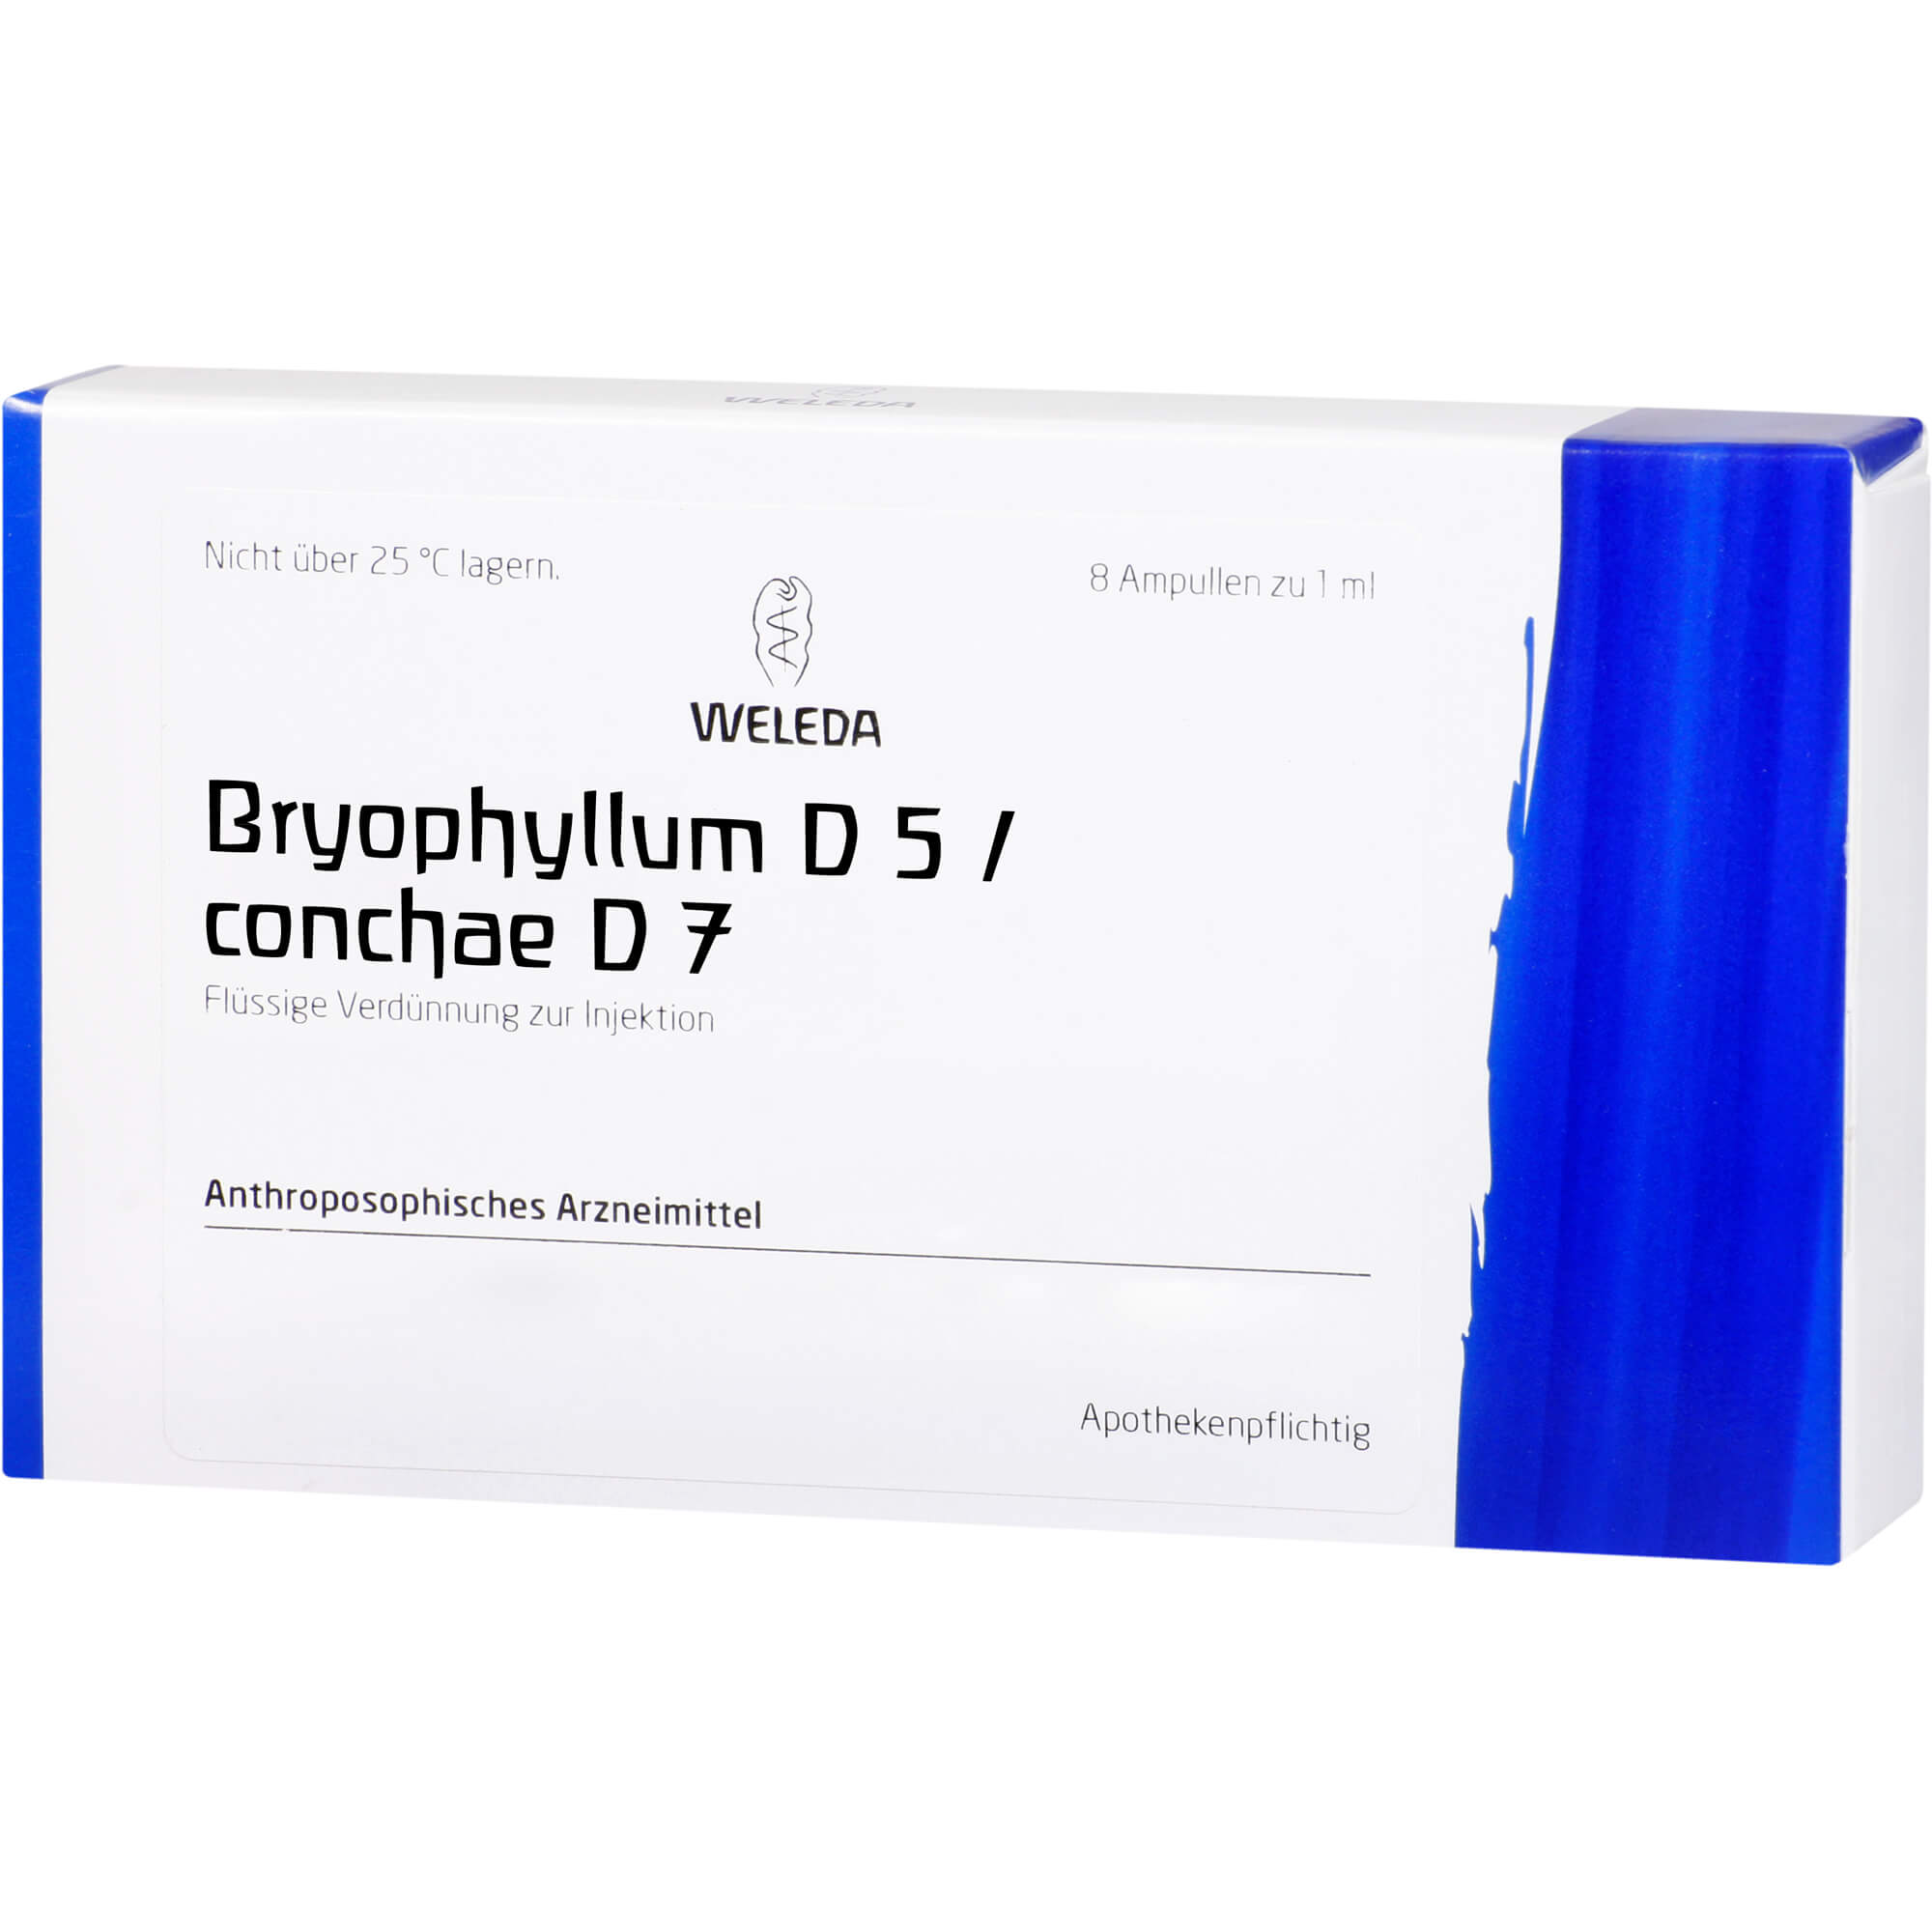 Bryophyllum D5/Conchae D7 aa